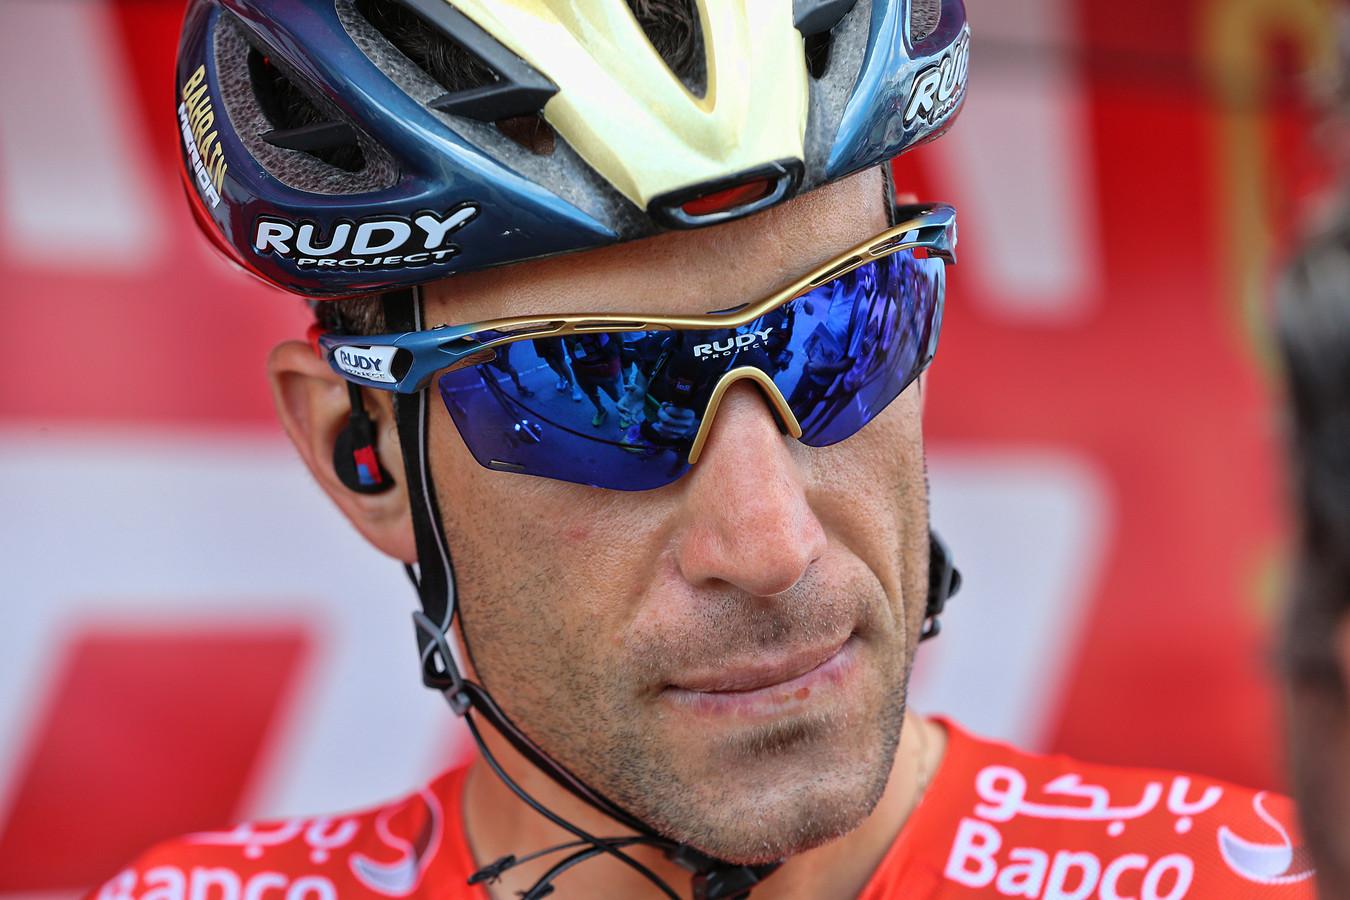 Mžr de Bretagne GuerlŽdan - France - wielrennen - cycling - cyclisme - radsport -  Vincenzo Nibali (ITA - Bahrain - Merida)  pictured during the 105th Tour de France - stage - 5 from Brest to Mžr de Bretagne GuerlŽdan - 181KM - photo IB/LB/RB/Cor Vos © 2018